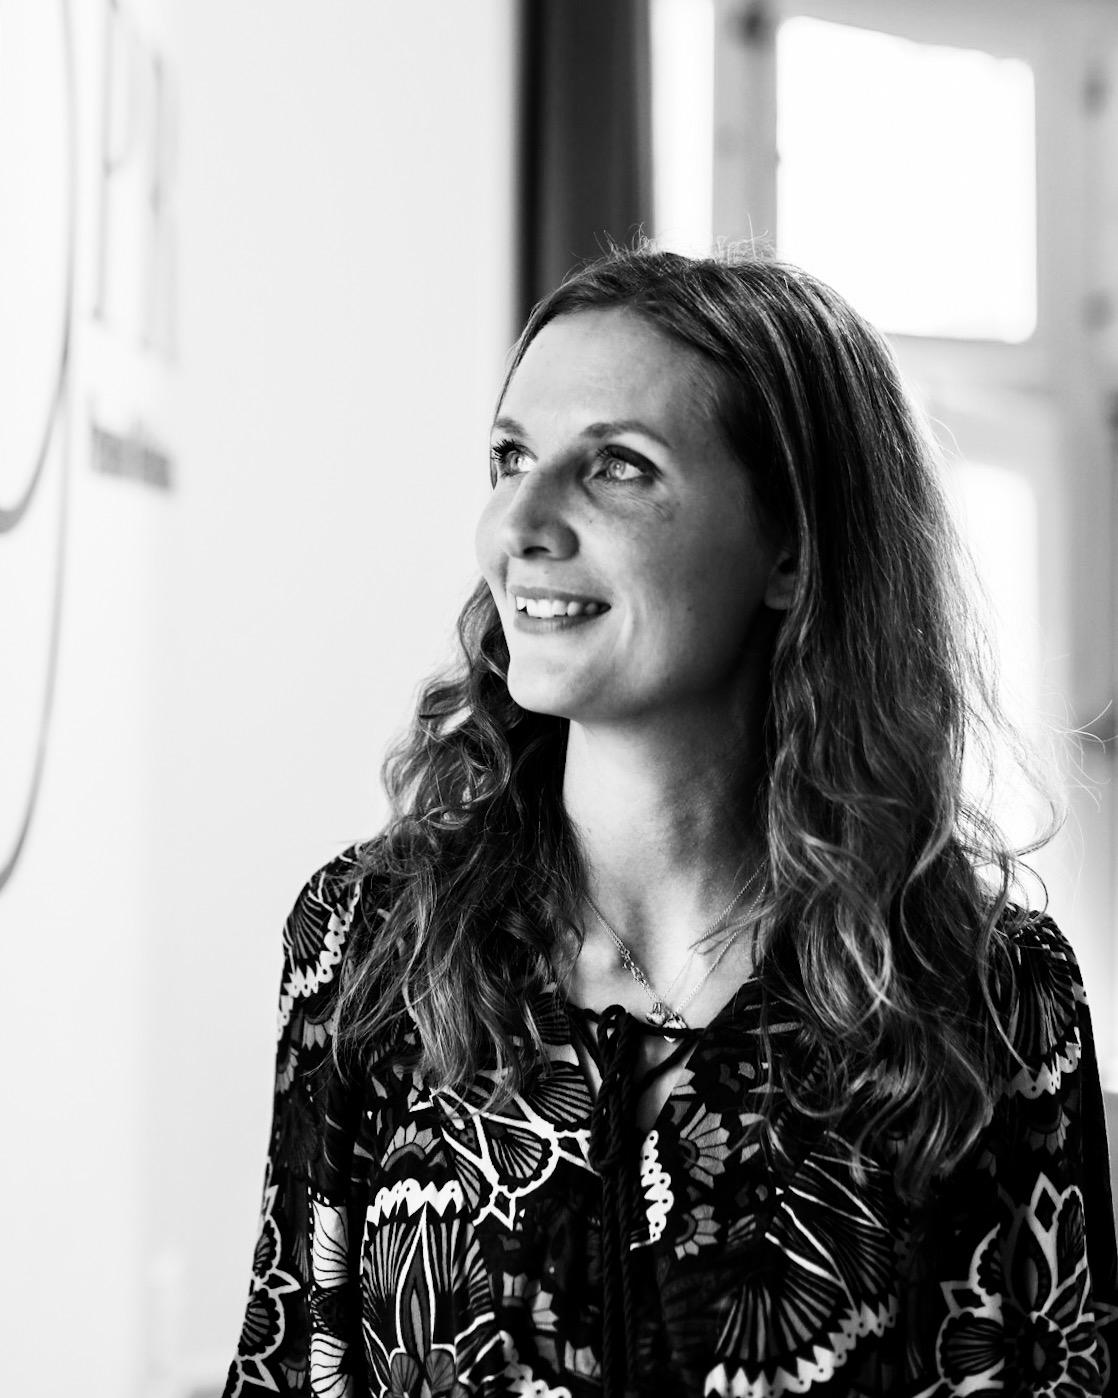 nina wiboltt - partner, brand communications directorhead of strategic and creative solutionsemail: nina@9pr.dkphone: + 45 22 14 20 84